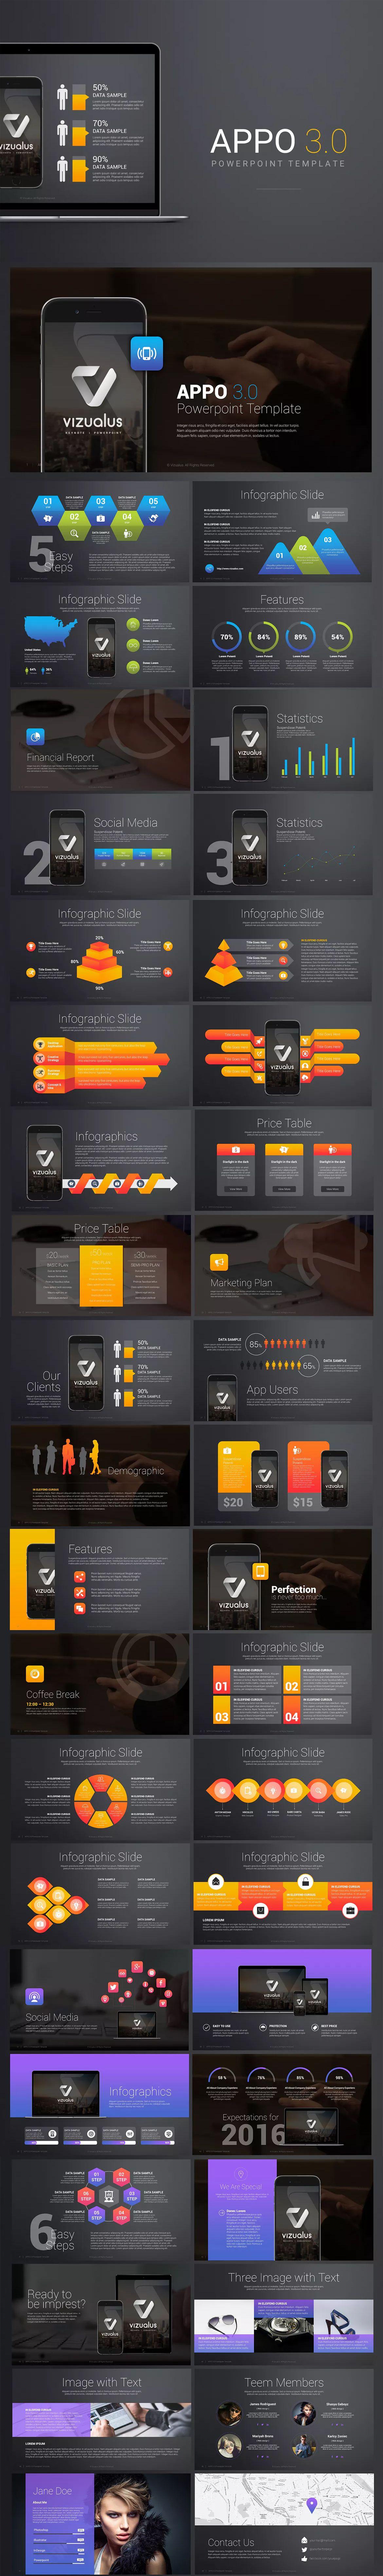 APPO 3 0 Powerpoint Template | PowerPoint Presentation